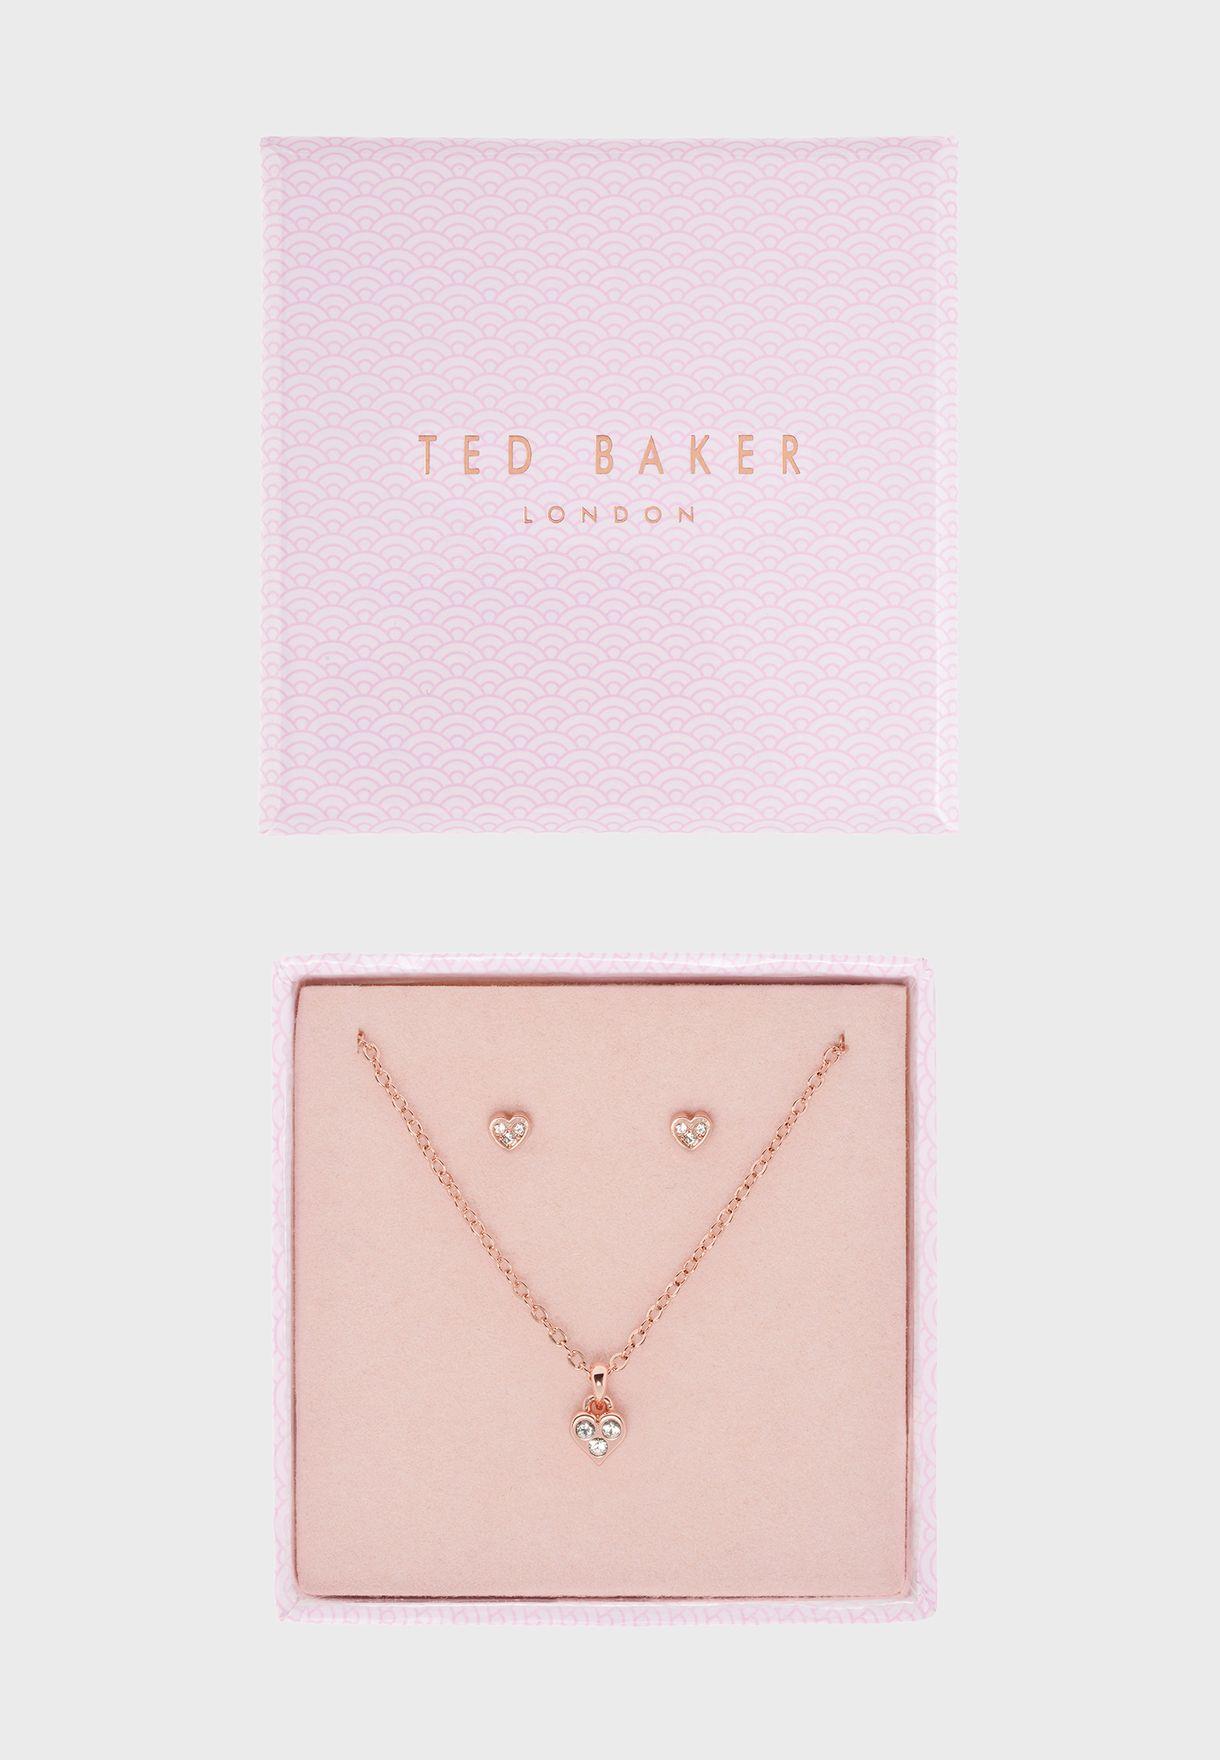 Nelzia Nano Heart Necklace+Earrings Set